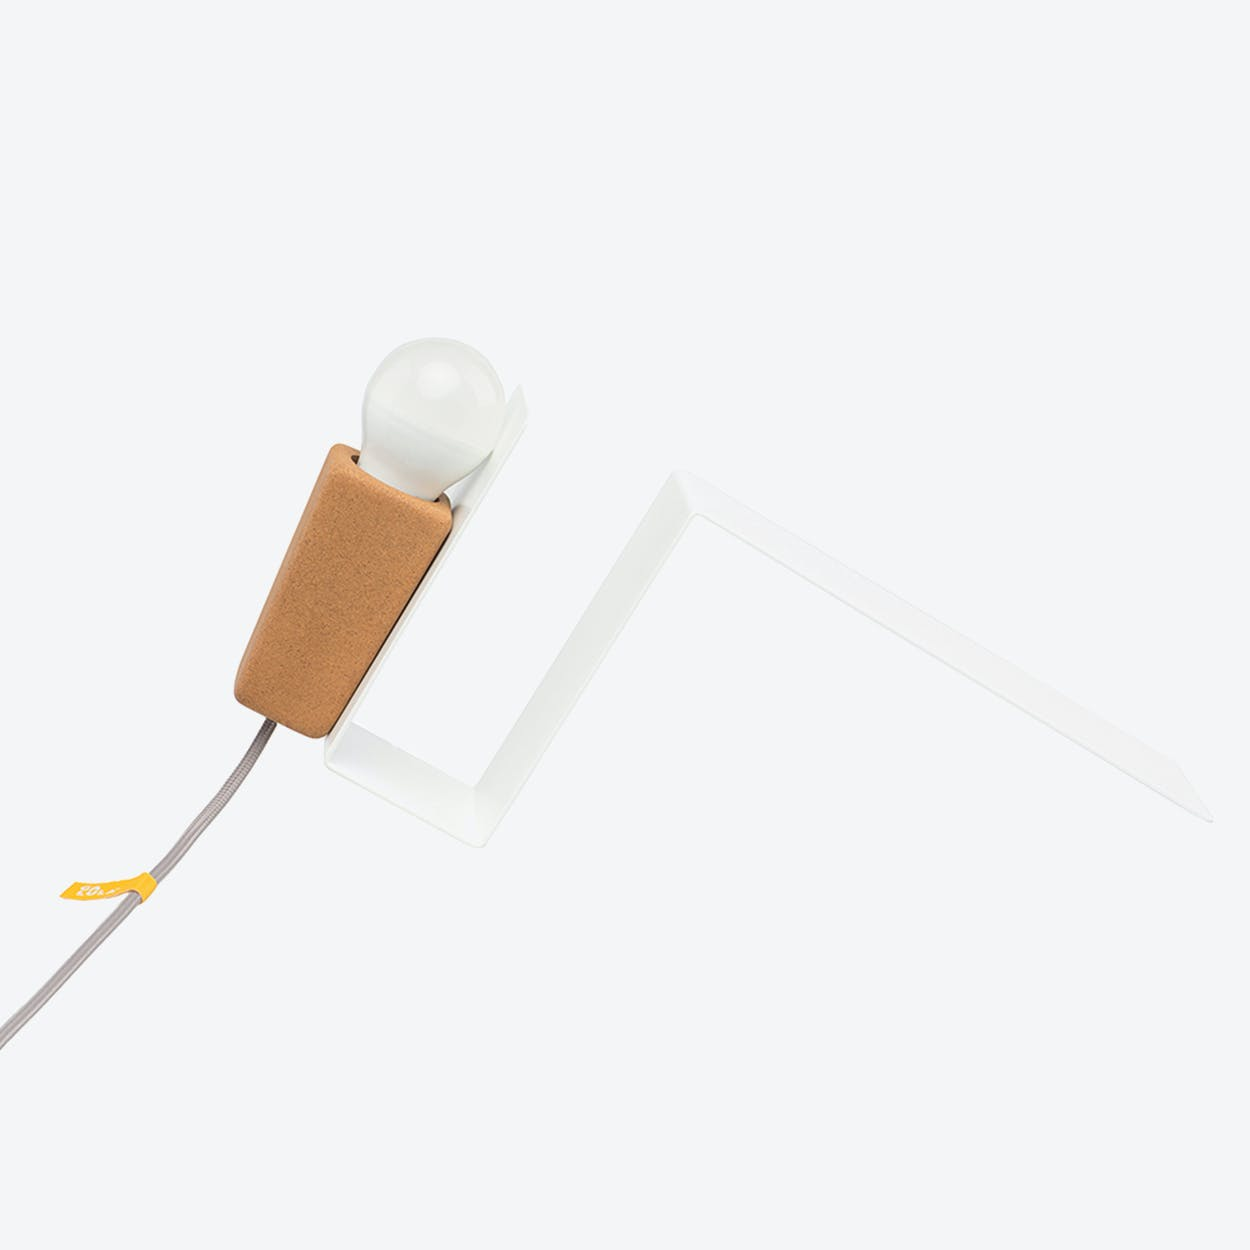 Glint Desk Lamp #1 in White Base & Grey Wire